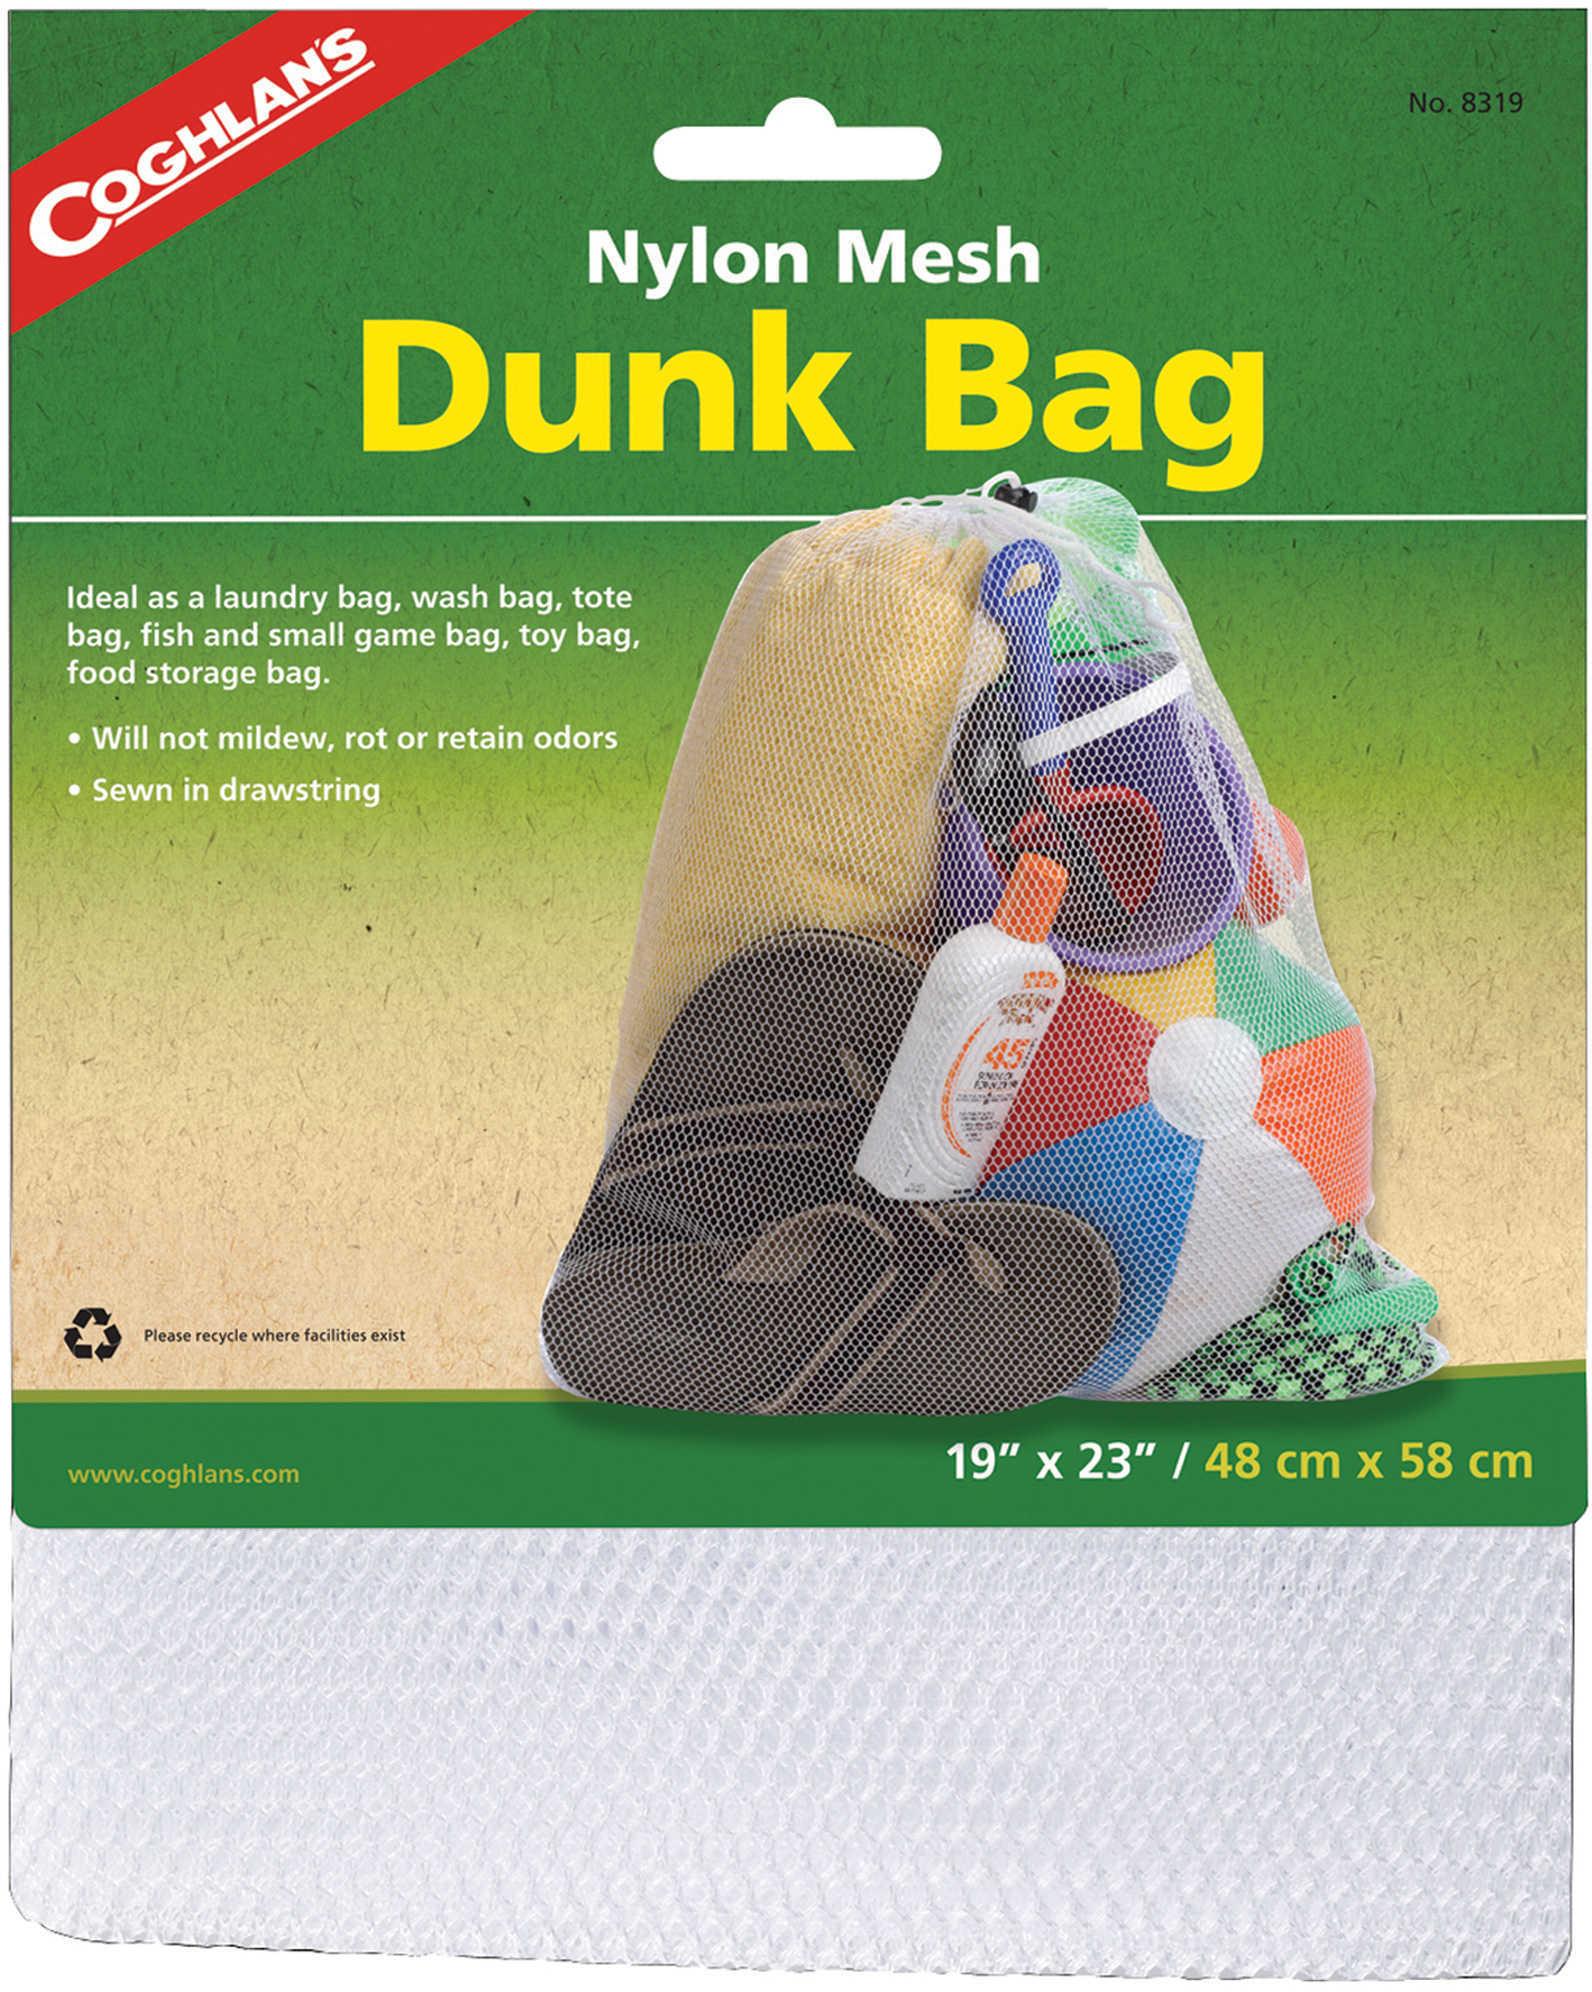 COGHLANS Nylon Dunk Bag Md: 8319